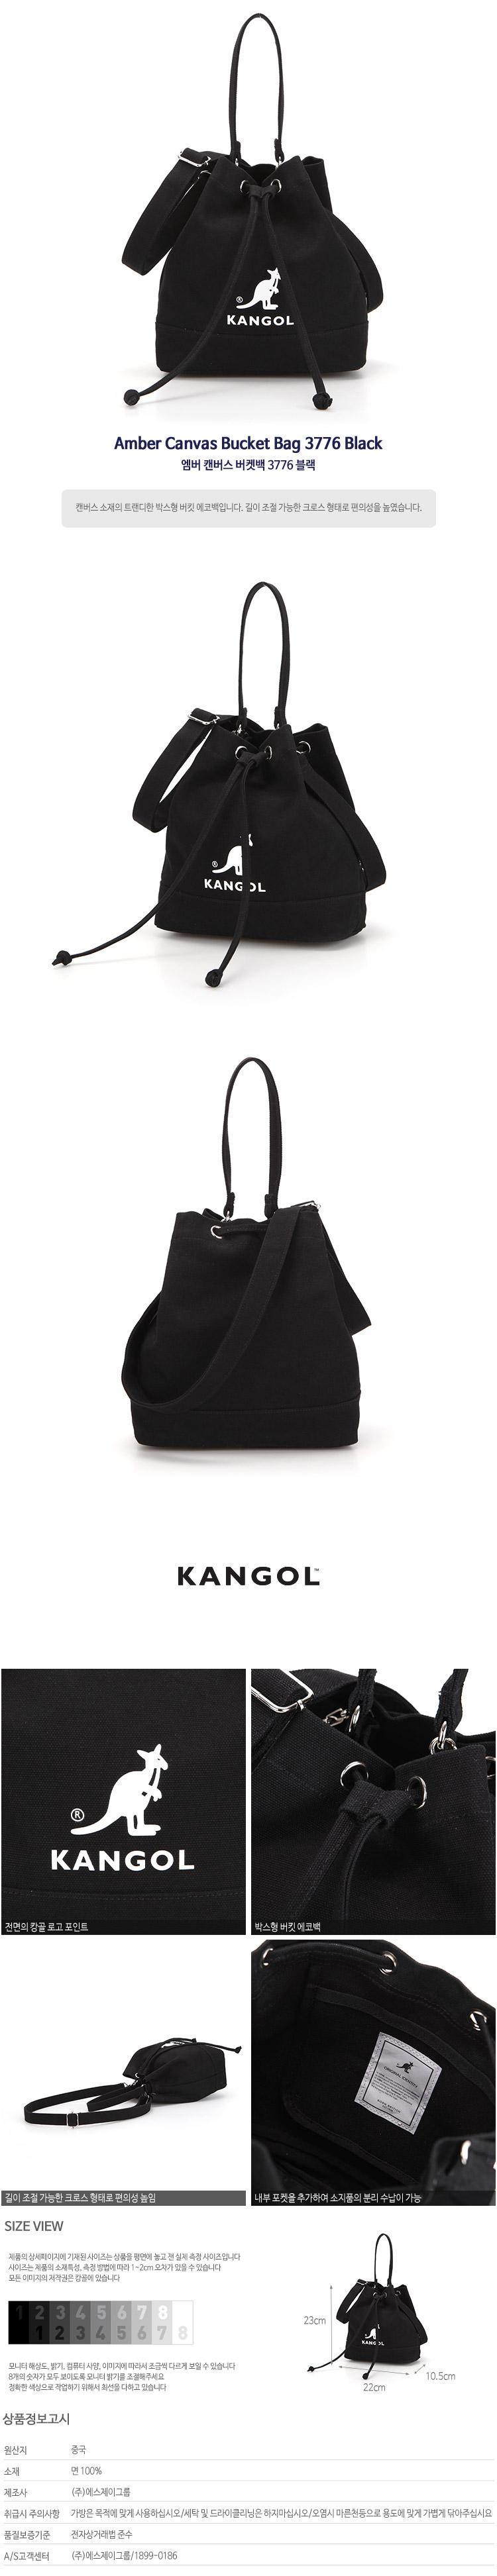 Amber Canvas Bucket Bag 3776 BLACK